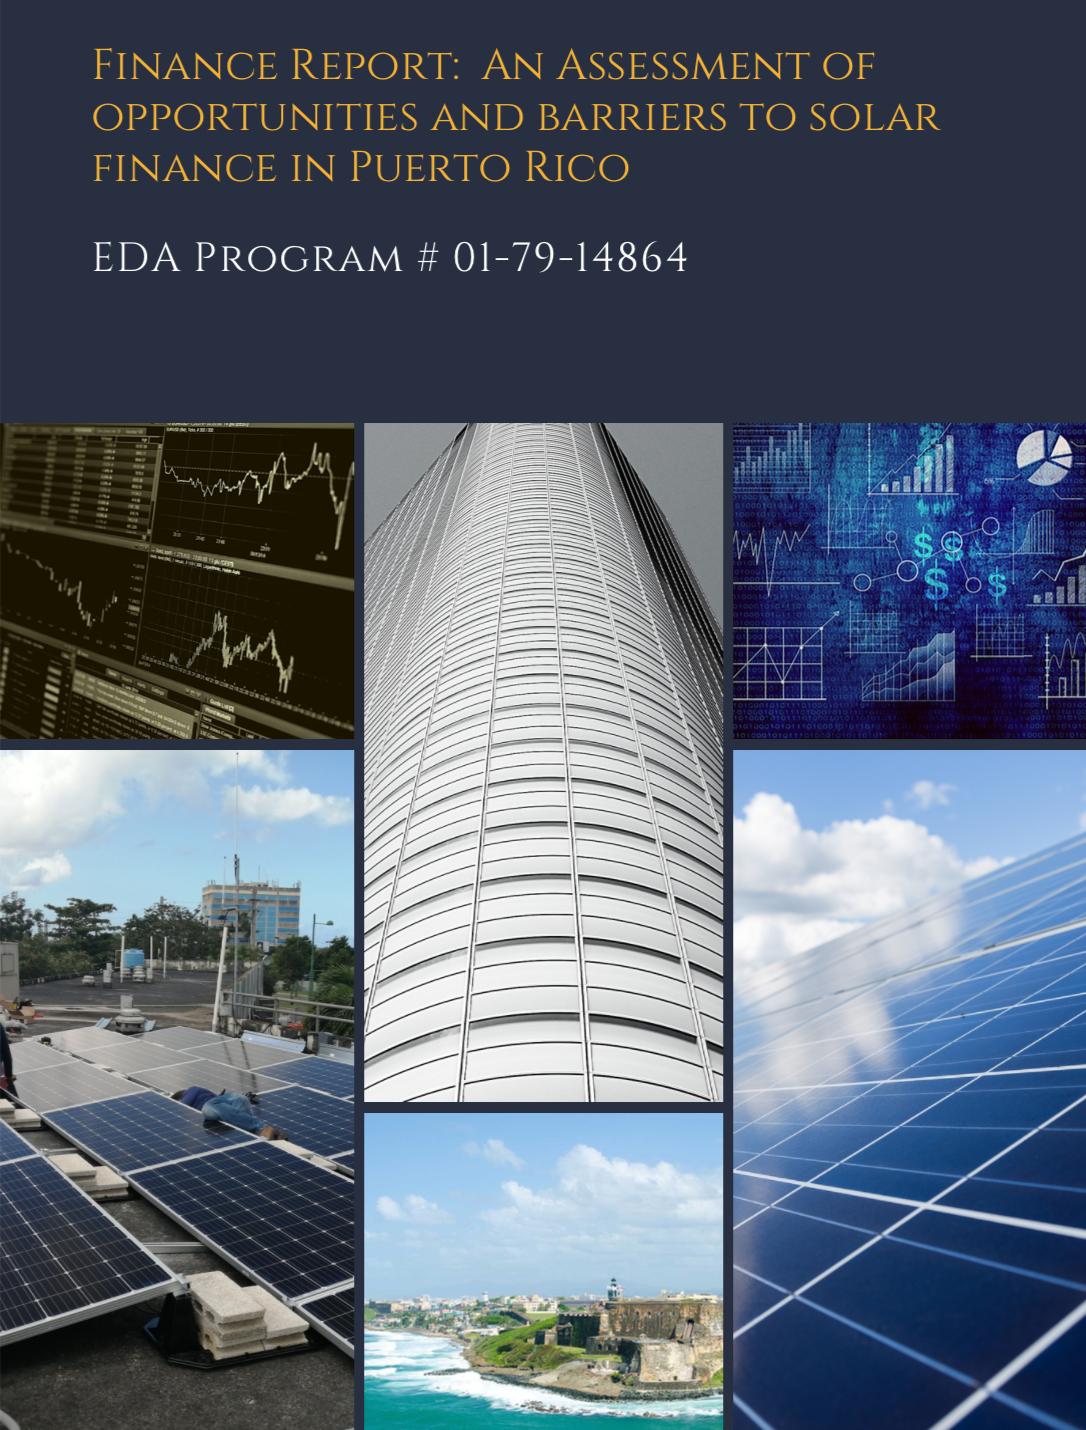 Puerto Rico Solar Finance Report